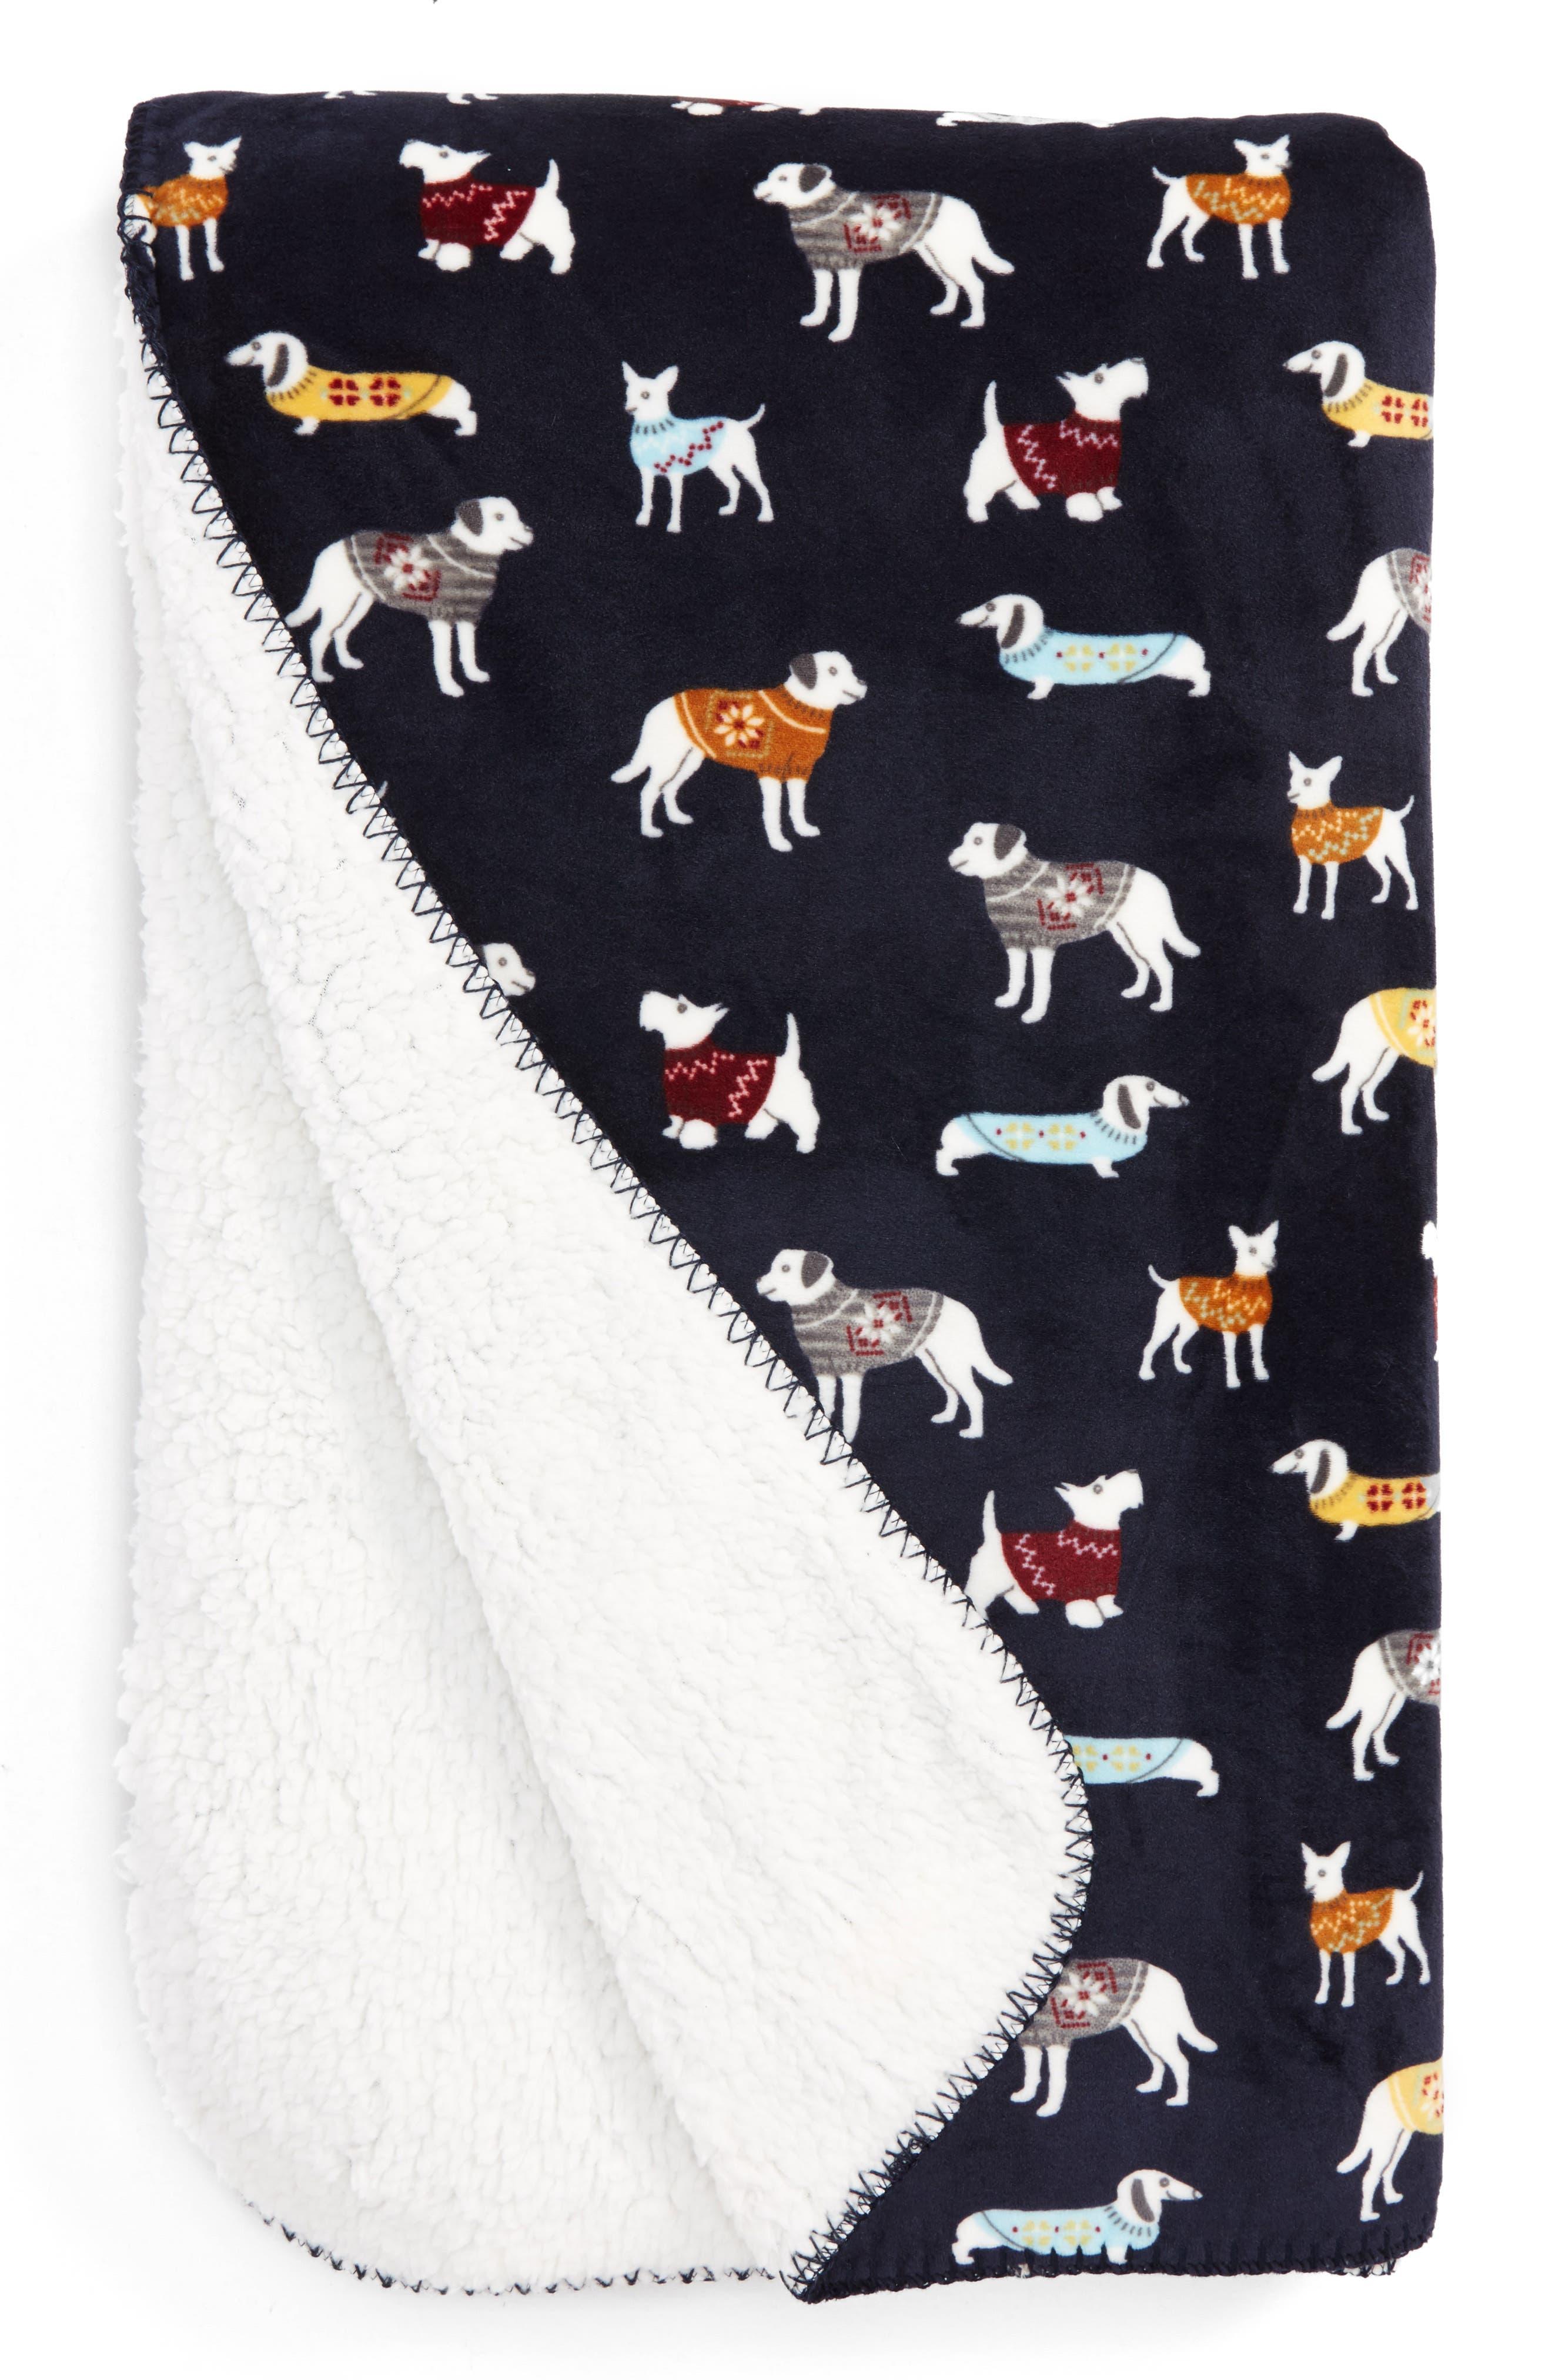 PJ Salvage Dogs Wearing Sweaters Blanket